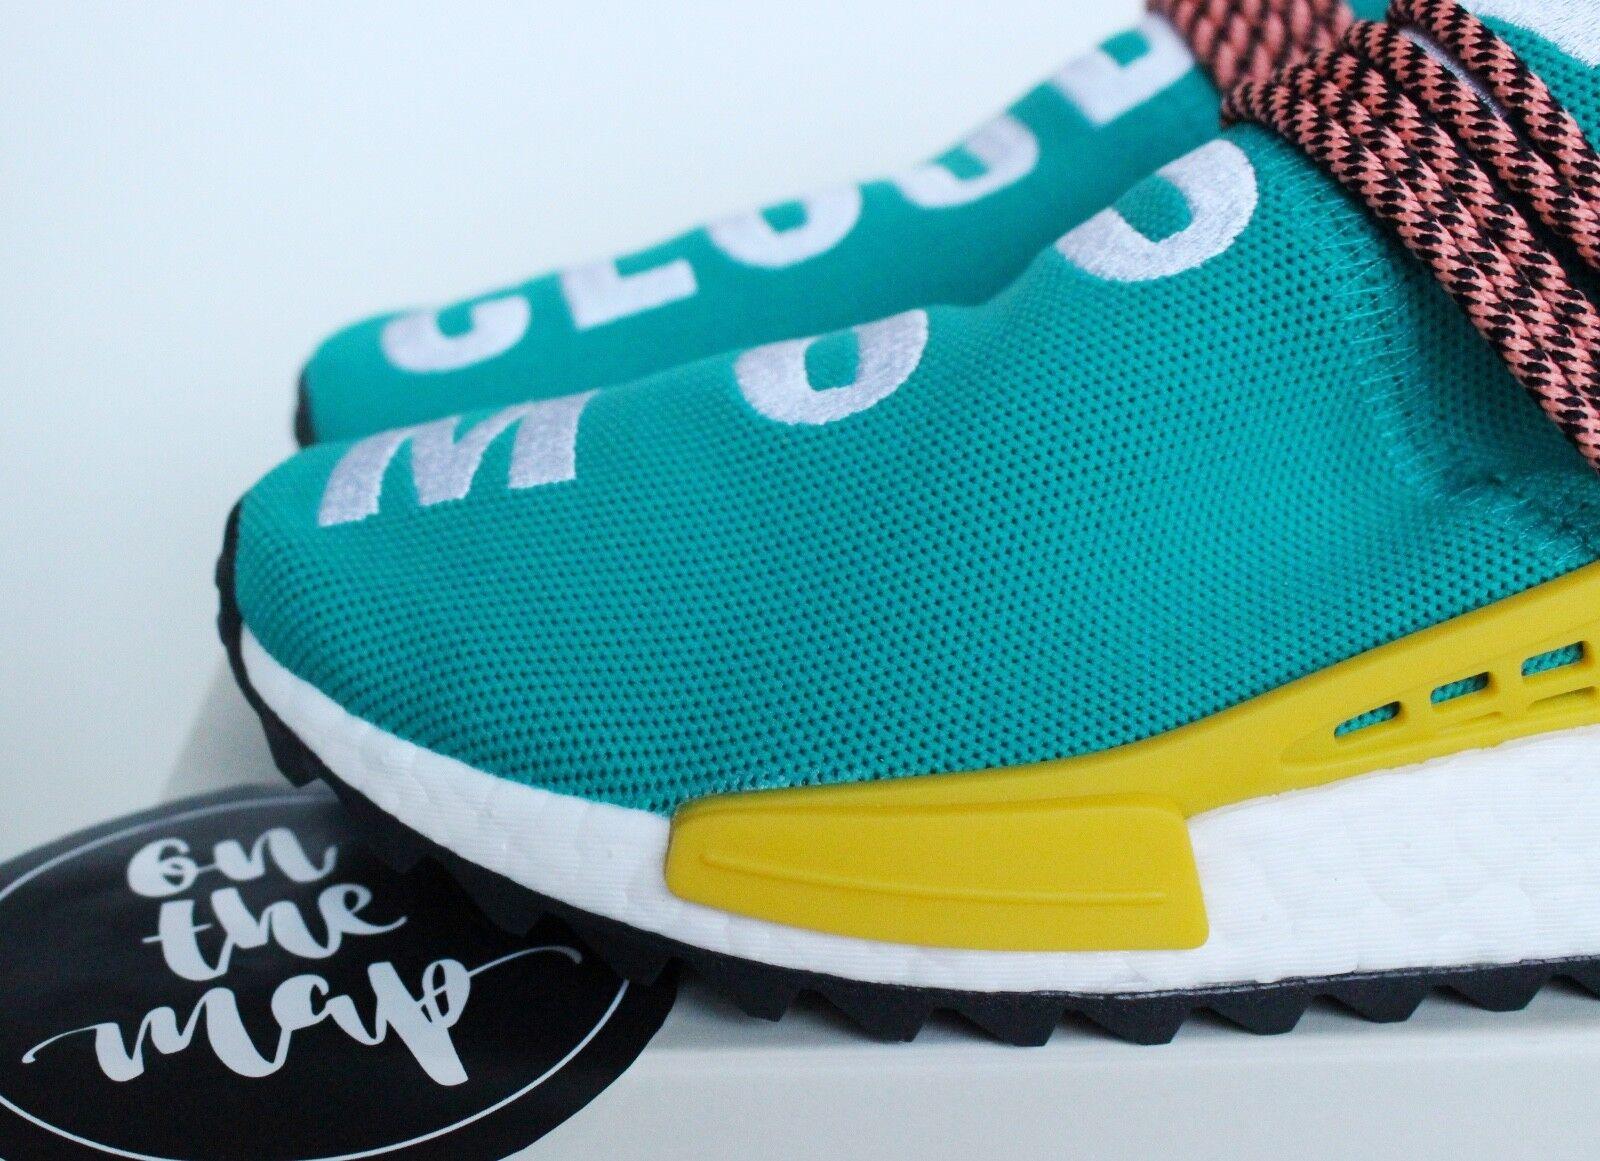 Adidas Pharrell Human Race HU NMD Trail Teal Verde Verde Verde Sun Glow 5 7 8 11 10 12 New 1b6f55